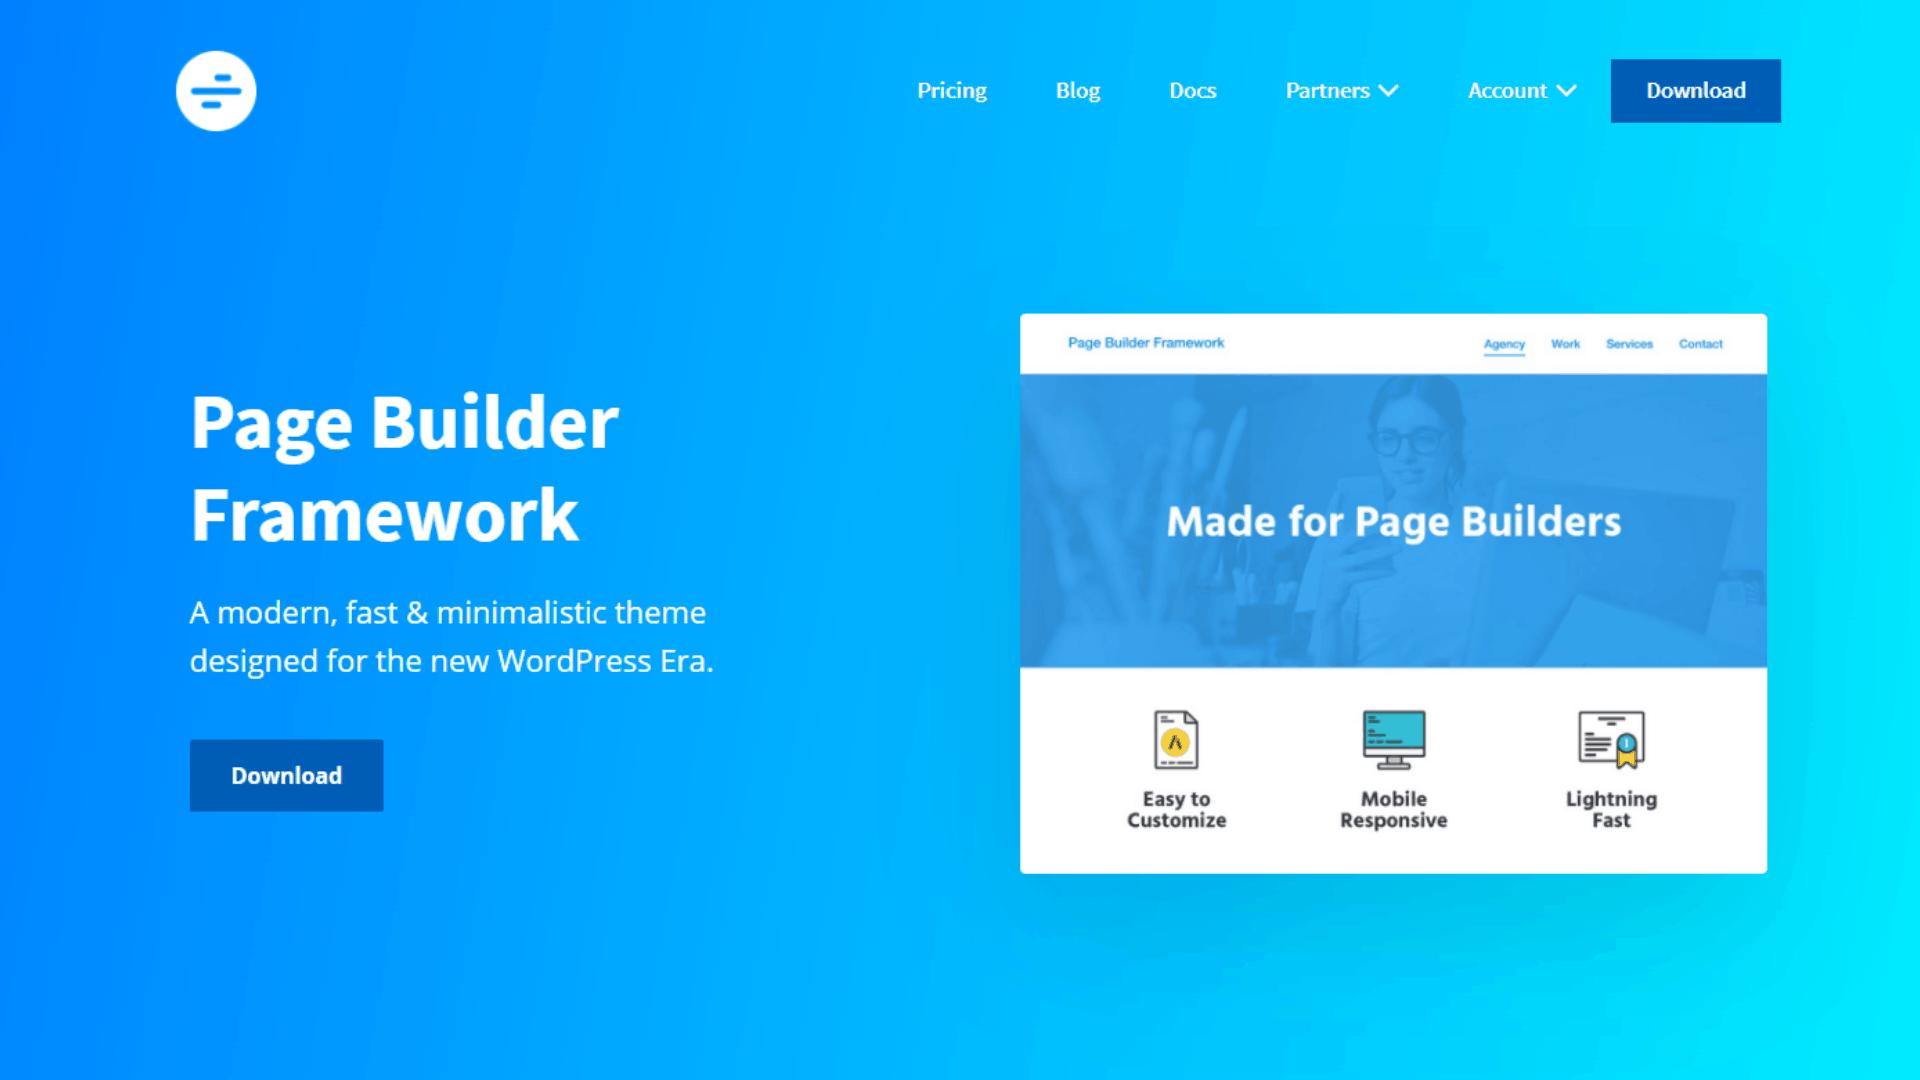 page builder framework home page